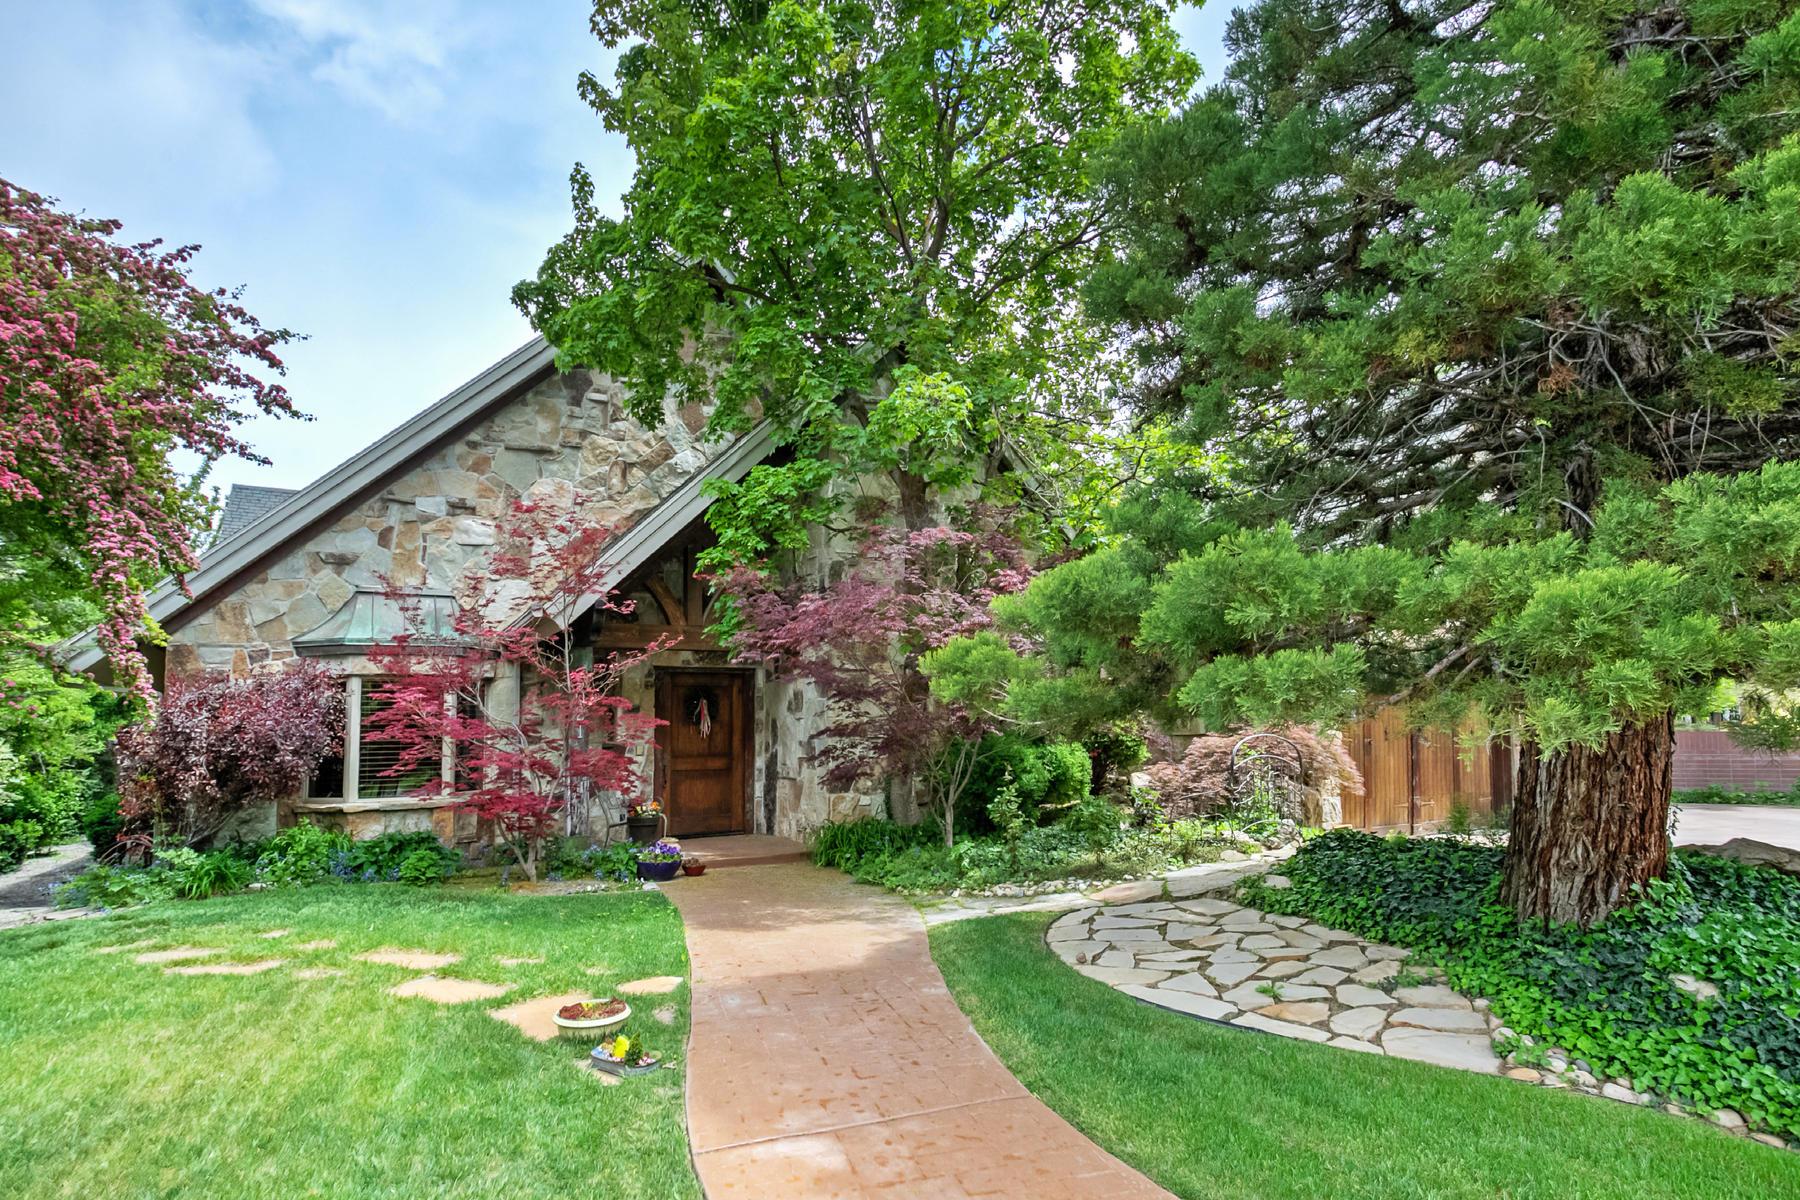 Villa per Vendita alle ore European 2 Story with Guest Cottage 5021 S Memory Ln Holladay, Utah, 84117 Stati Uniti